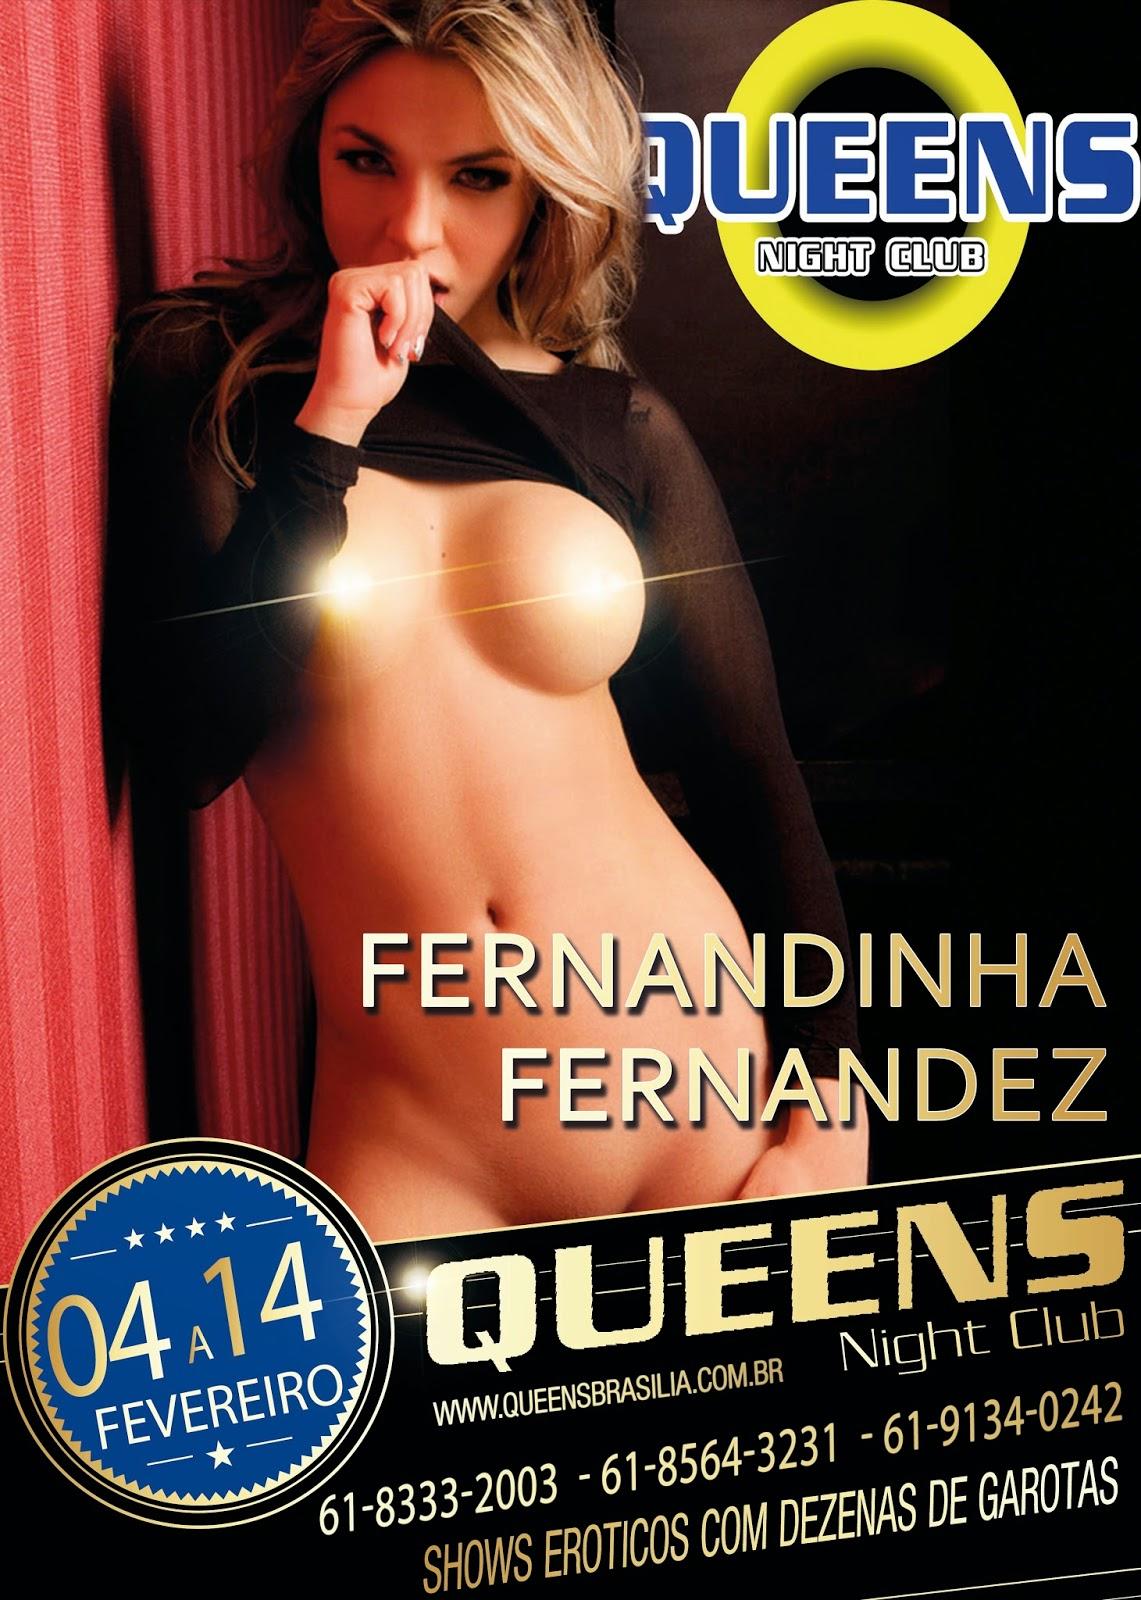 boate queens night club fernandinha fernandez